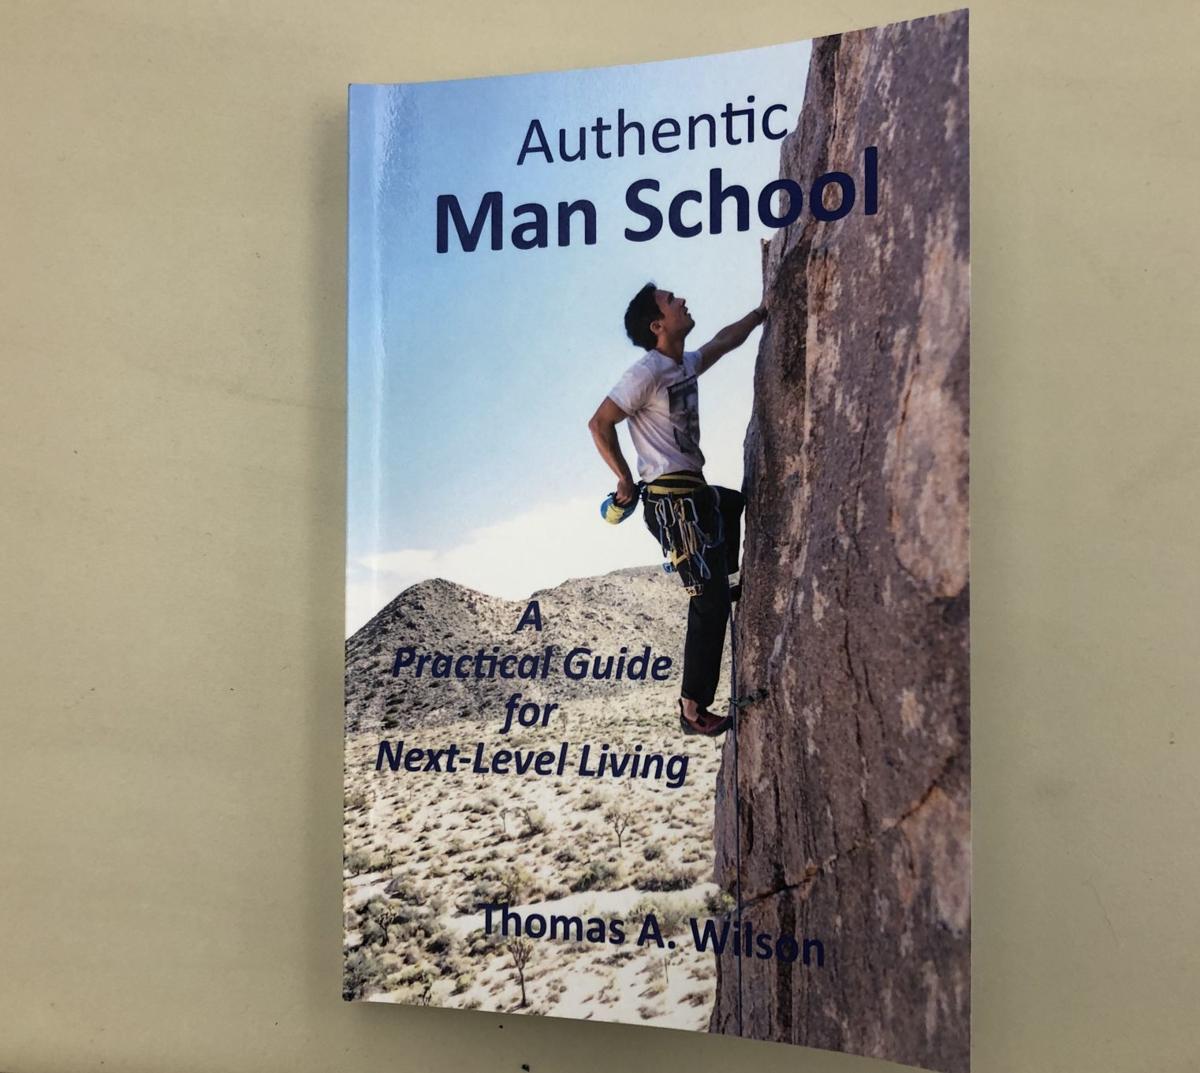 Authentic Man School